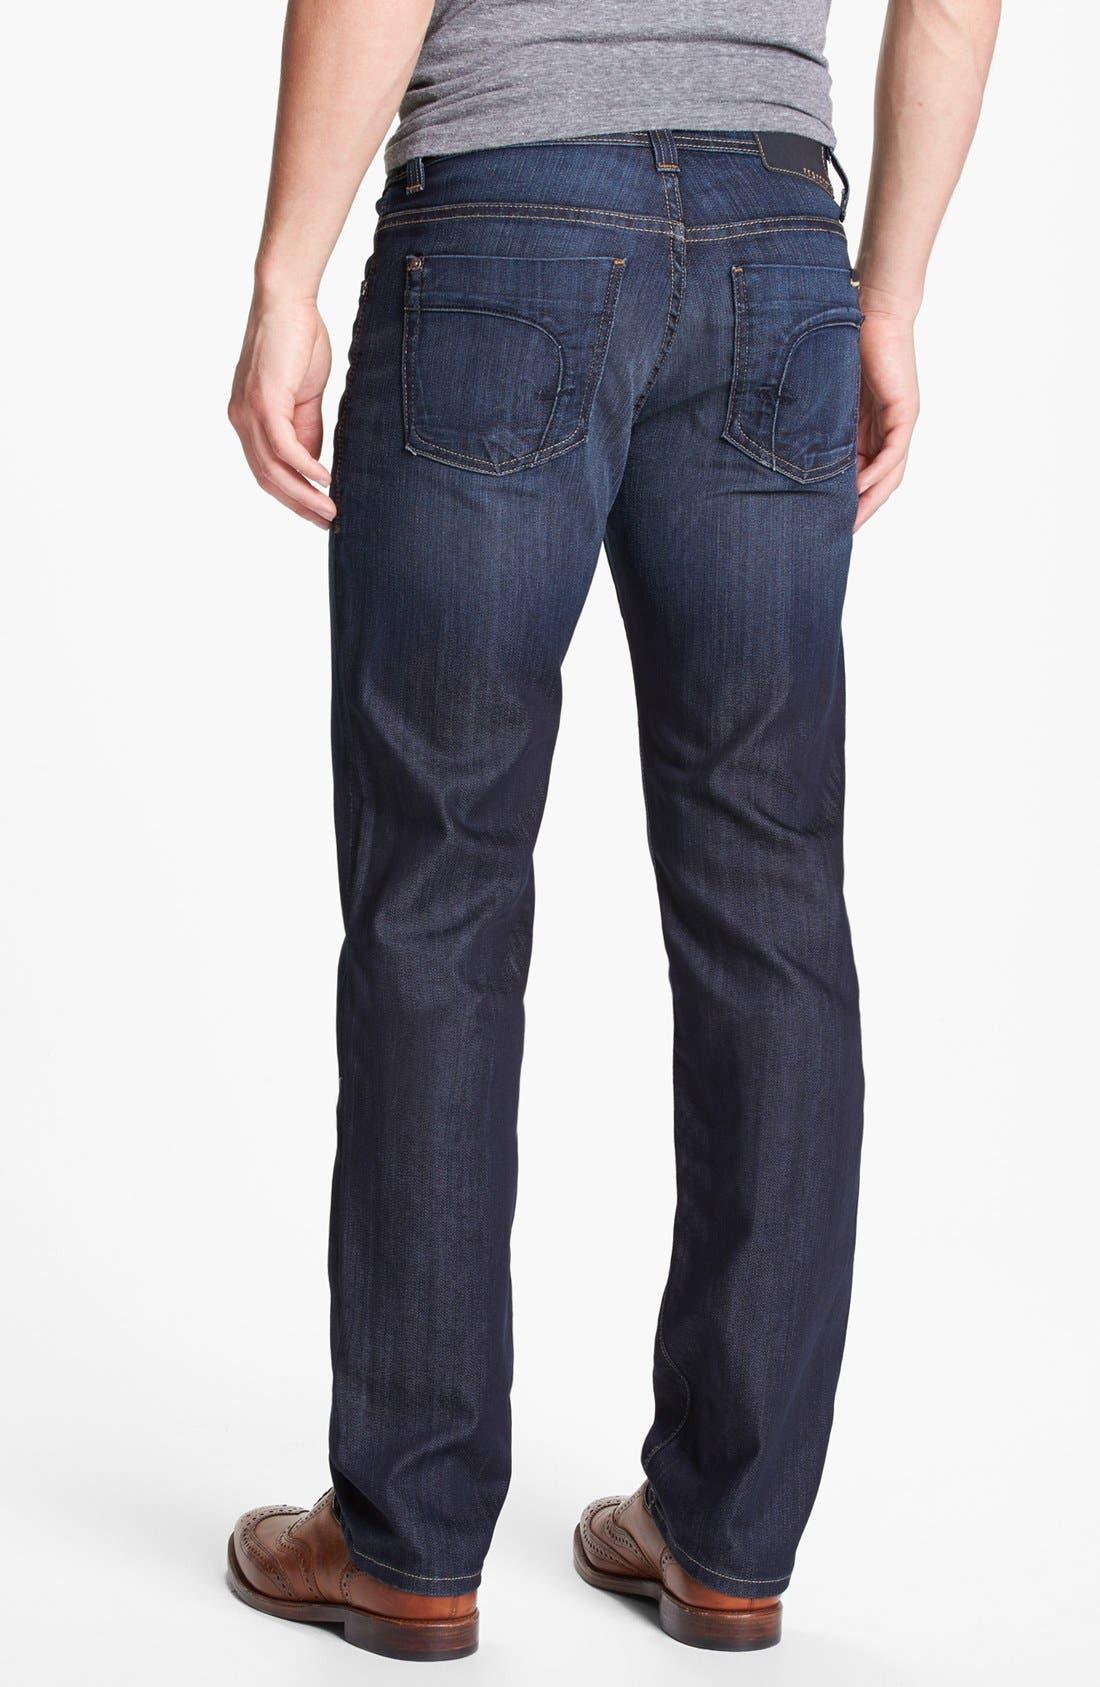 Alternate Image 2  - Fidelity Denim 'Slim Jim' Slim Fit Jeans (Trigger Dark) (Tall)